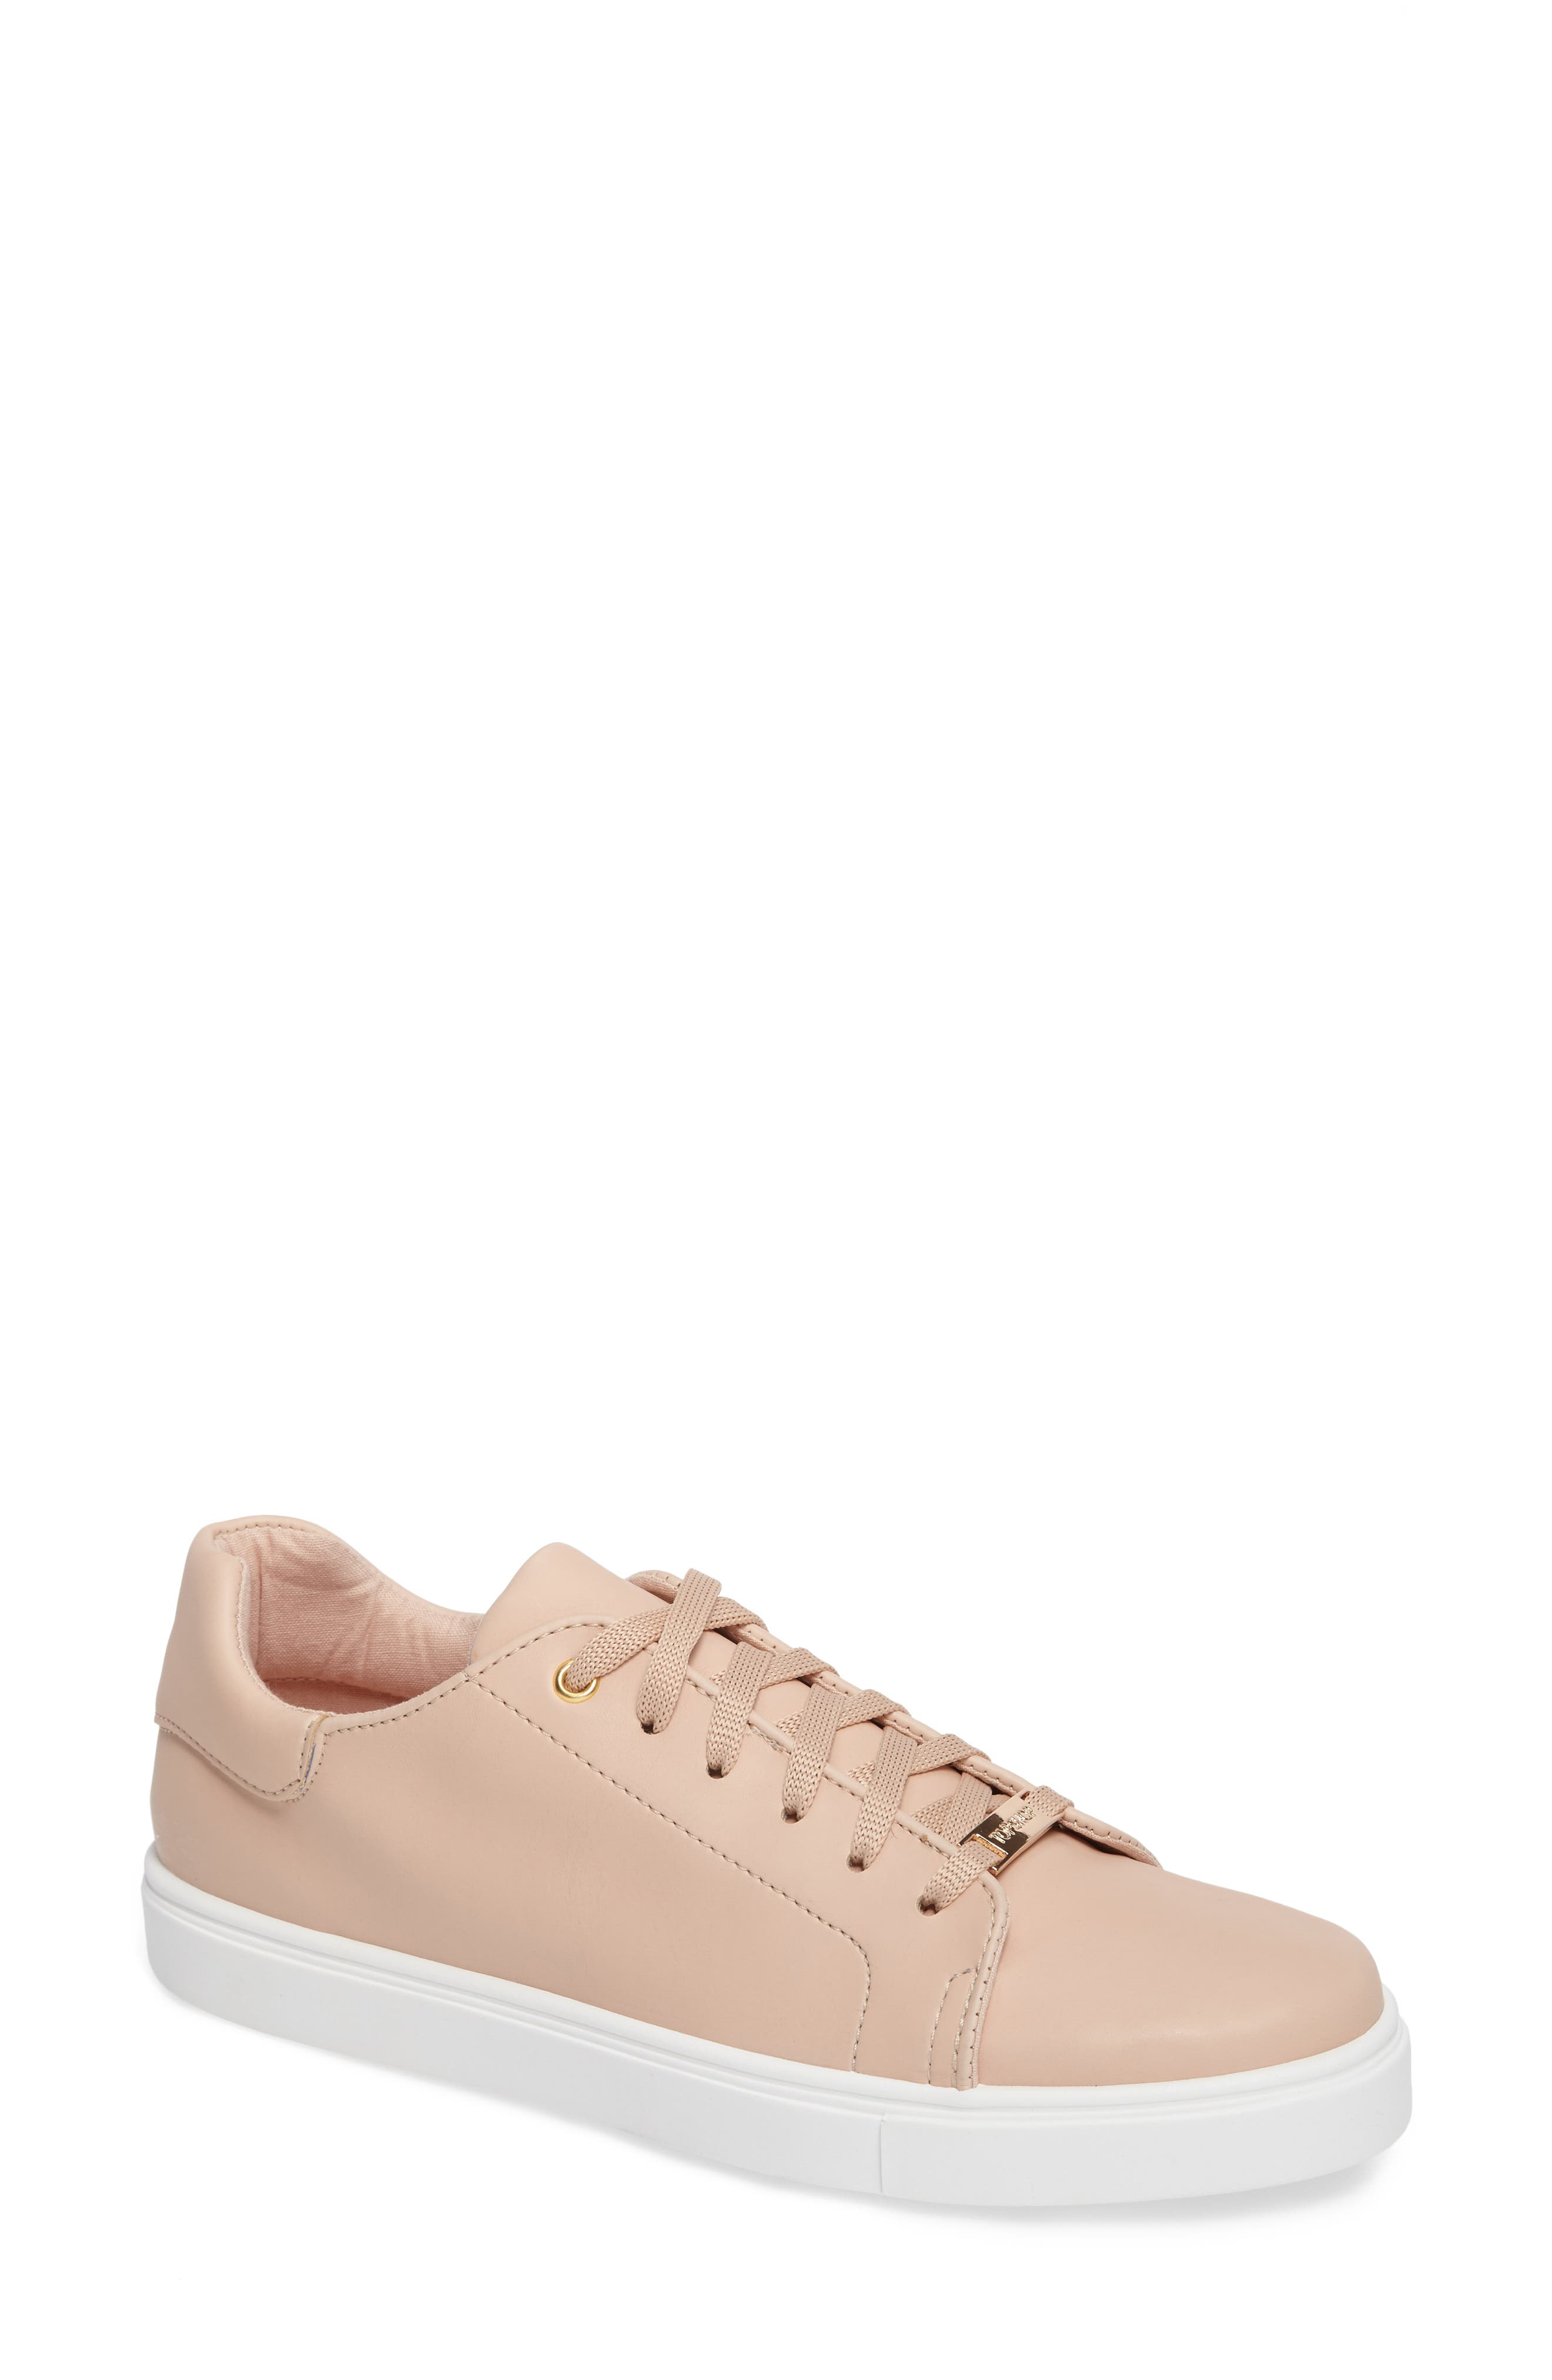 Main Image - Topshop Cluster Sneaker (Women)